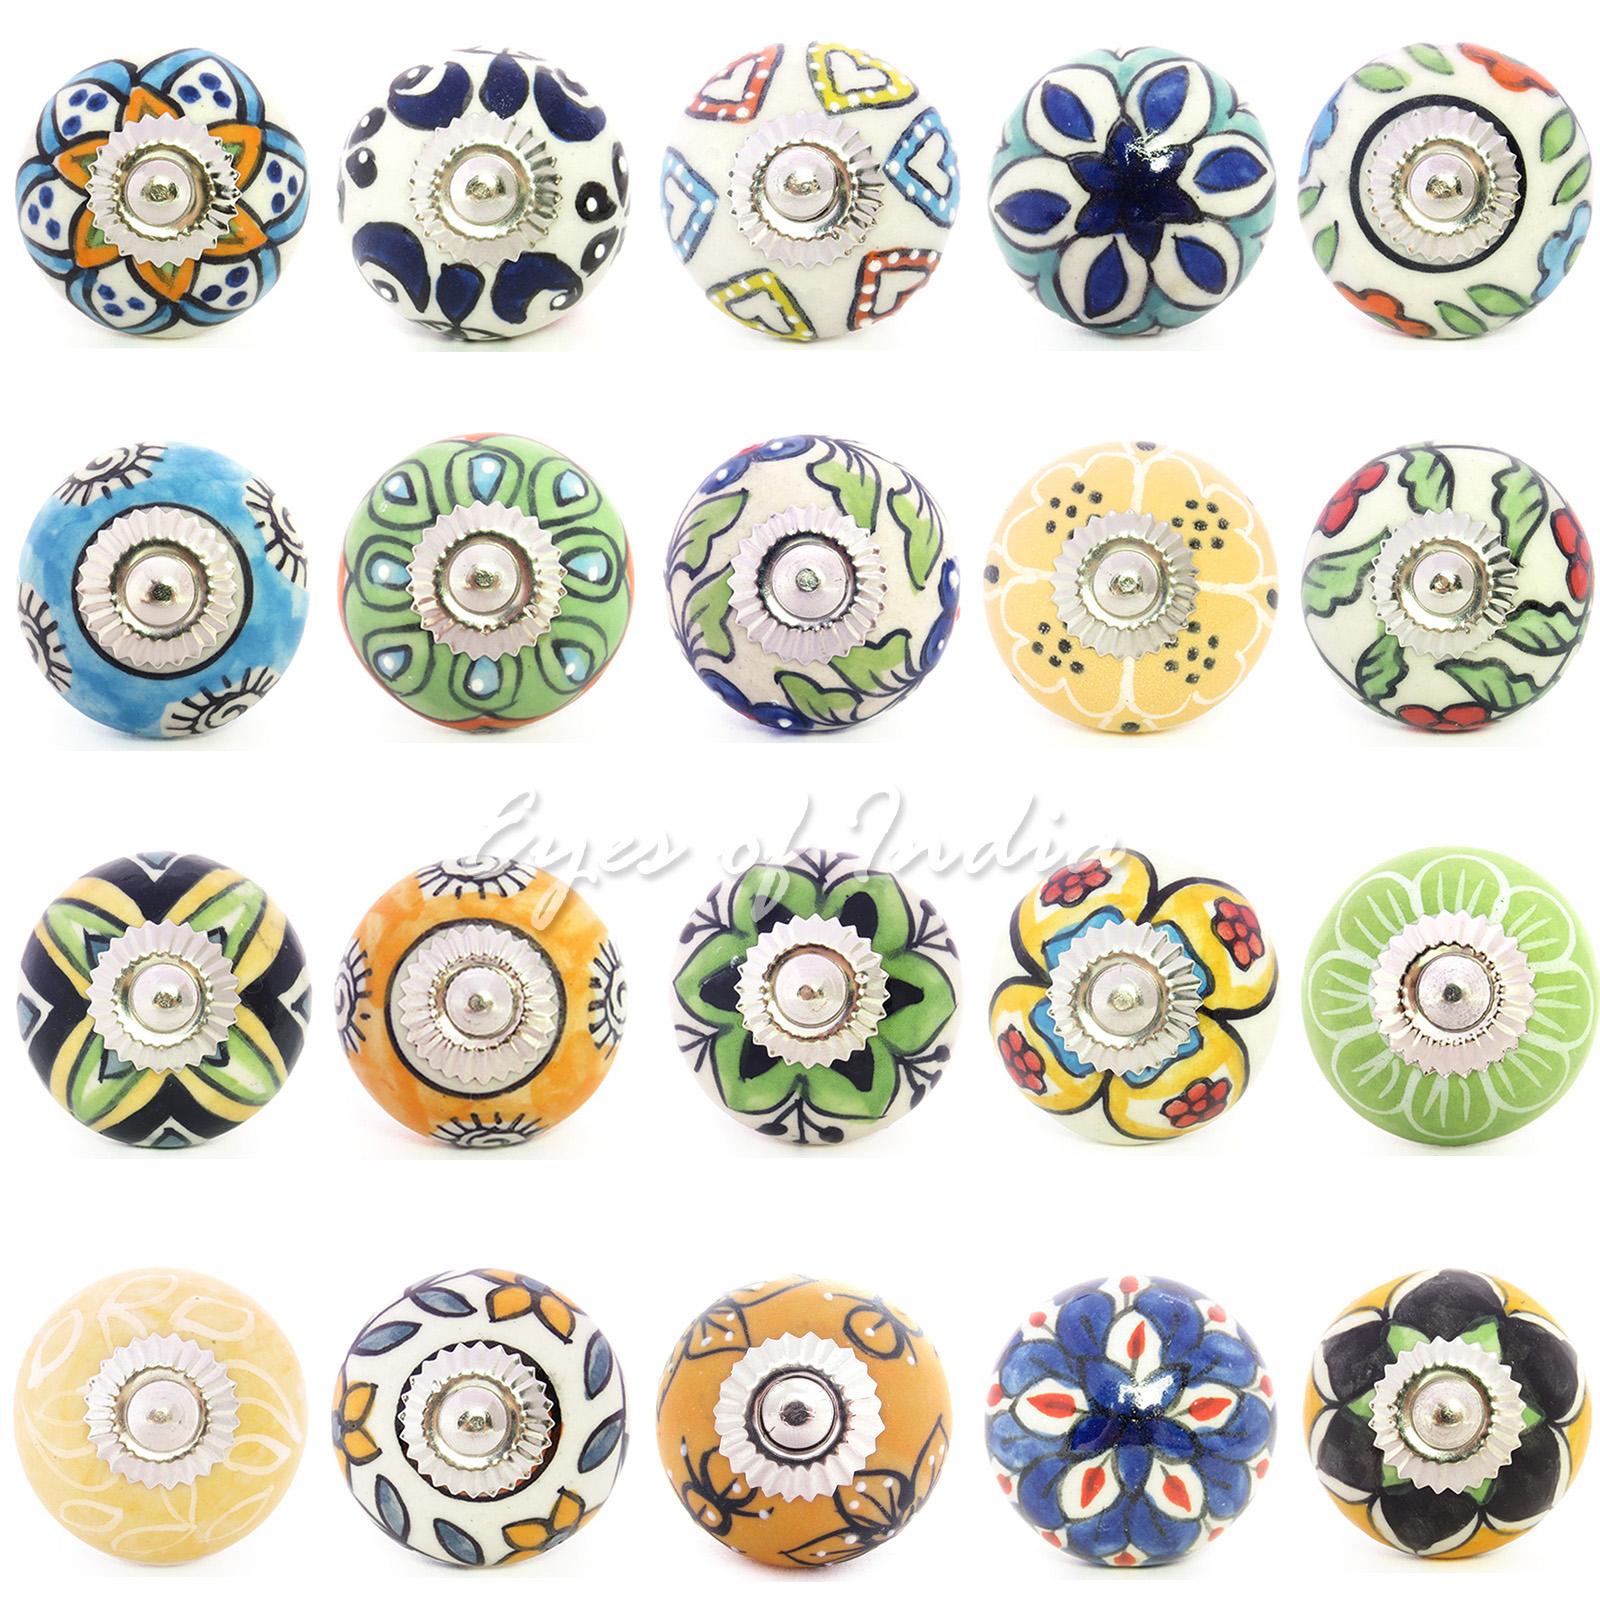 10 Knobs Multicolor Emboss Ceramic Knobs Hanmade Handpainted Kitchen Cabinet Drawer Knobs Cabinet Knobs Drawer Pulls Door Knobs Code 16